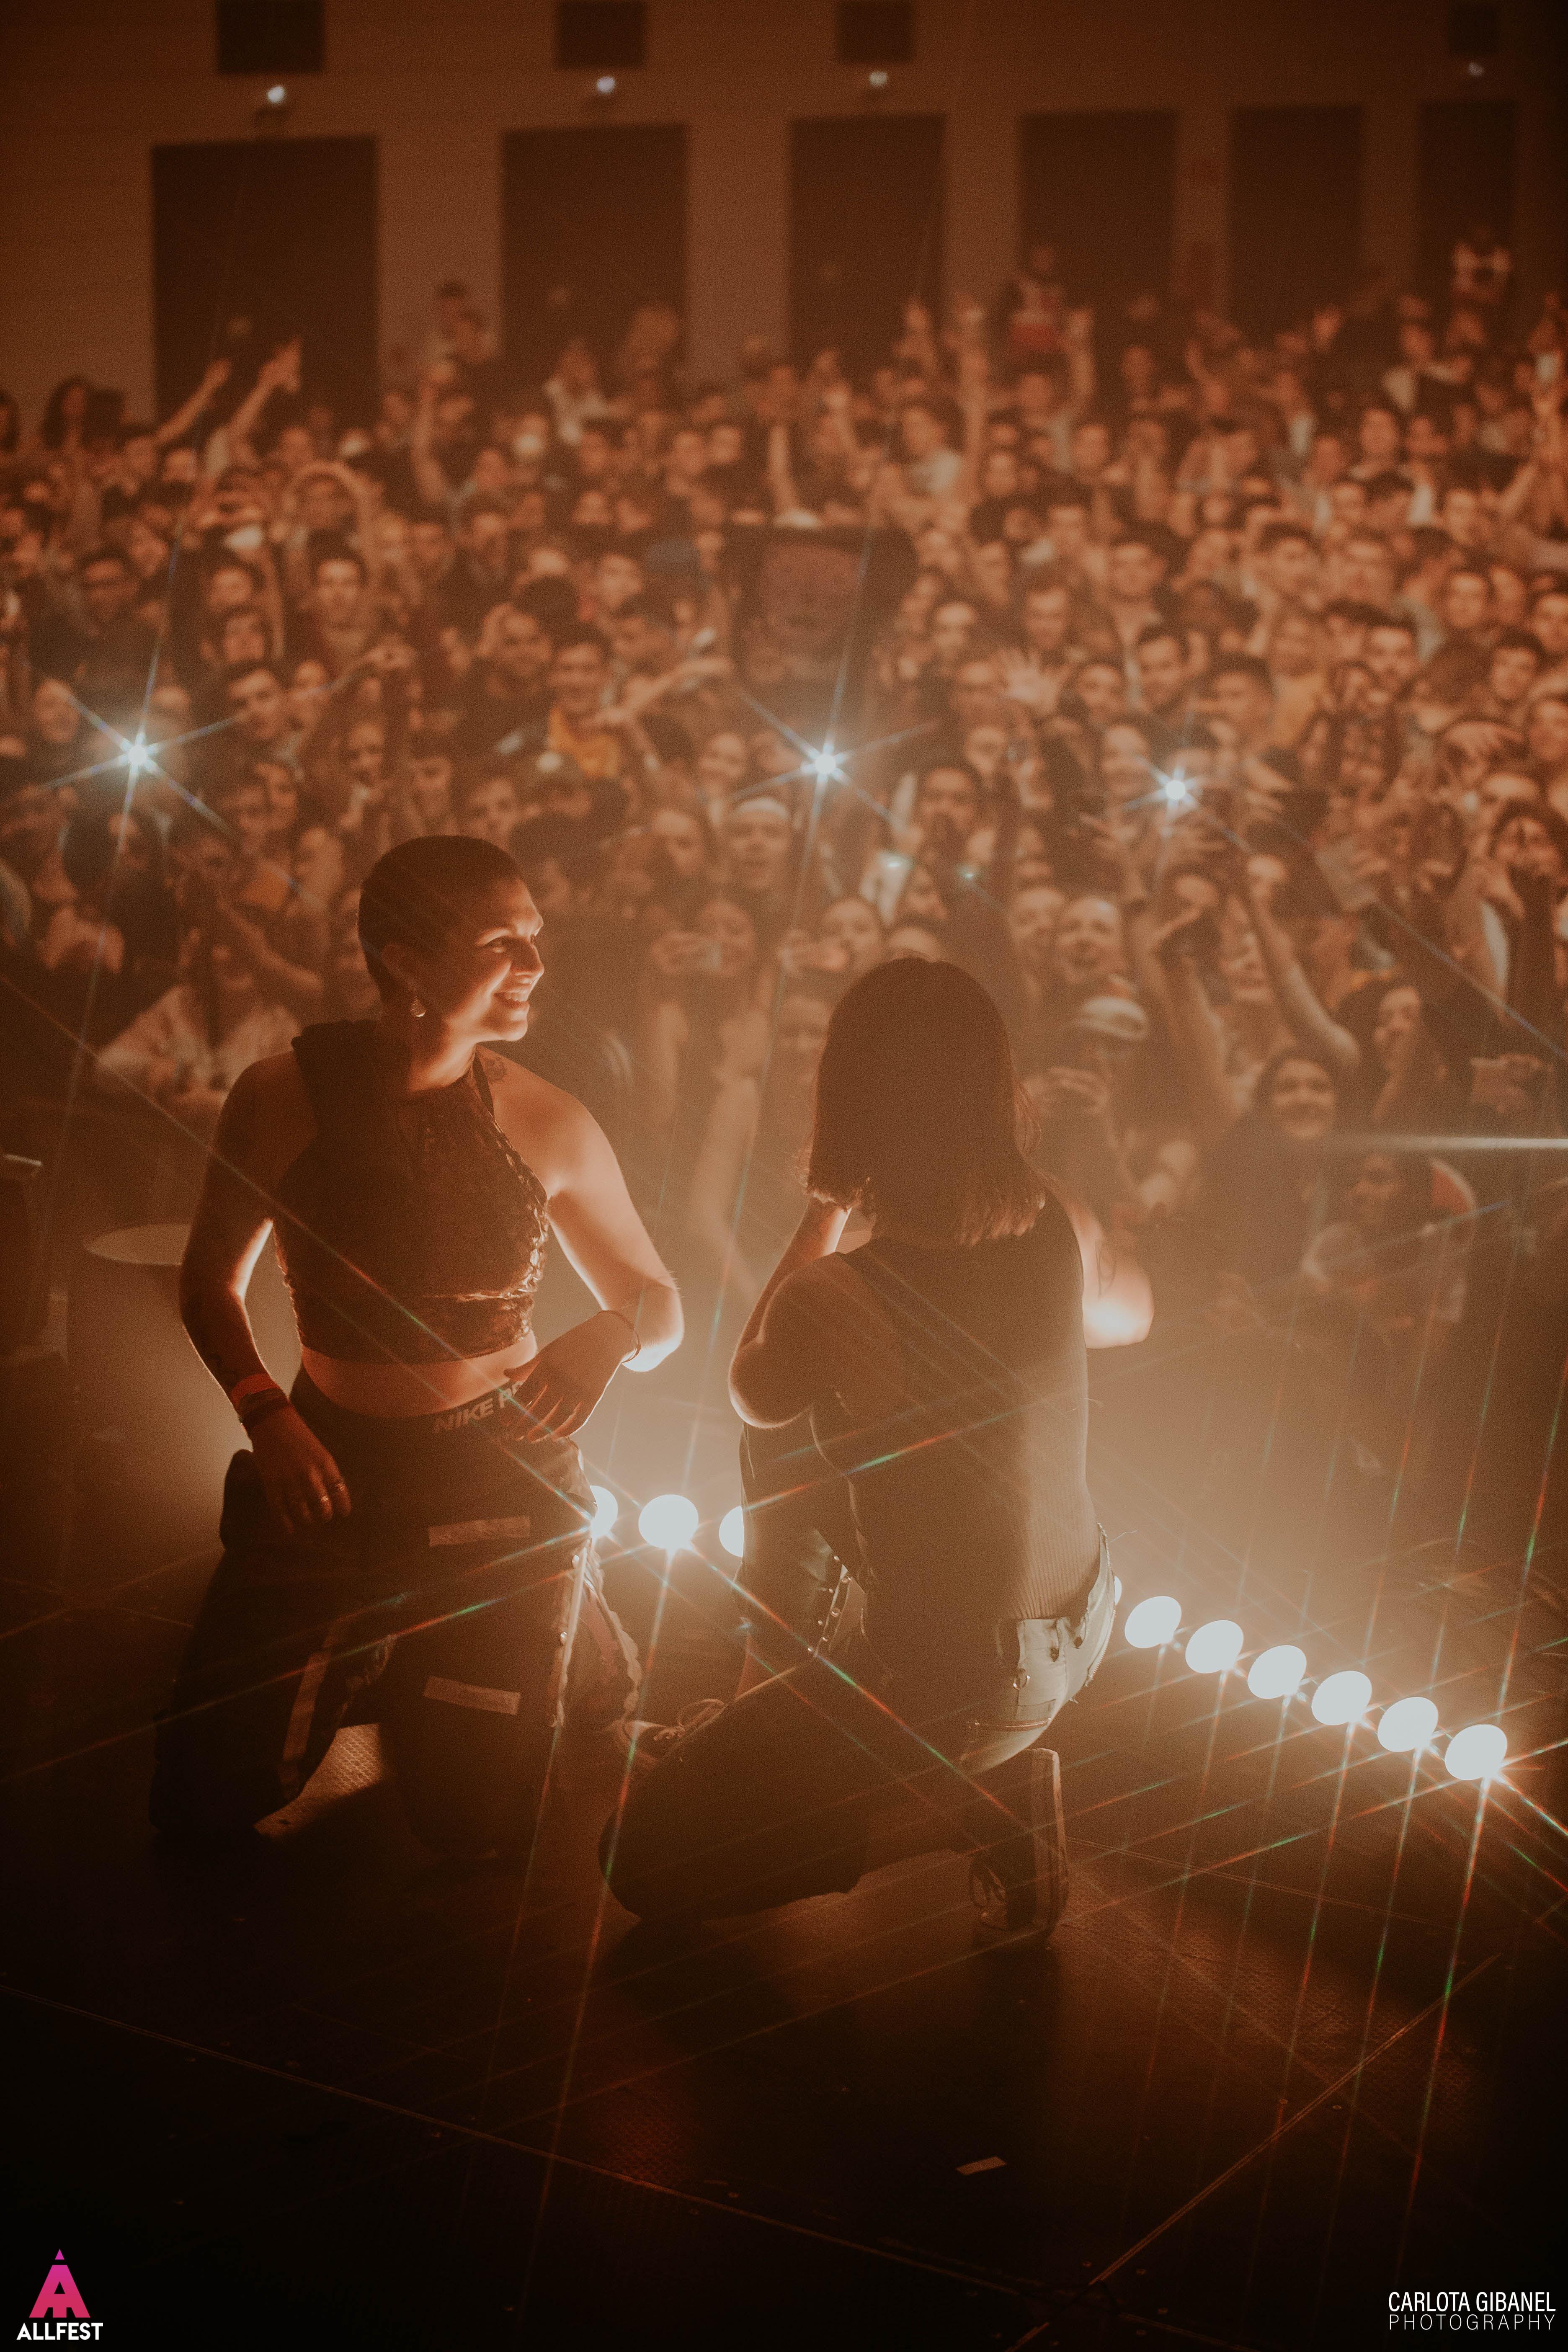 Krewella x Abroadfest | Carlota Gibanel (AllFest)